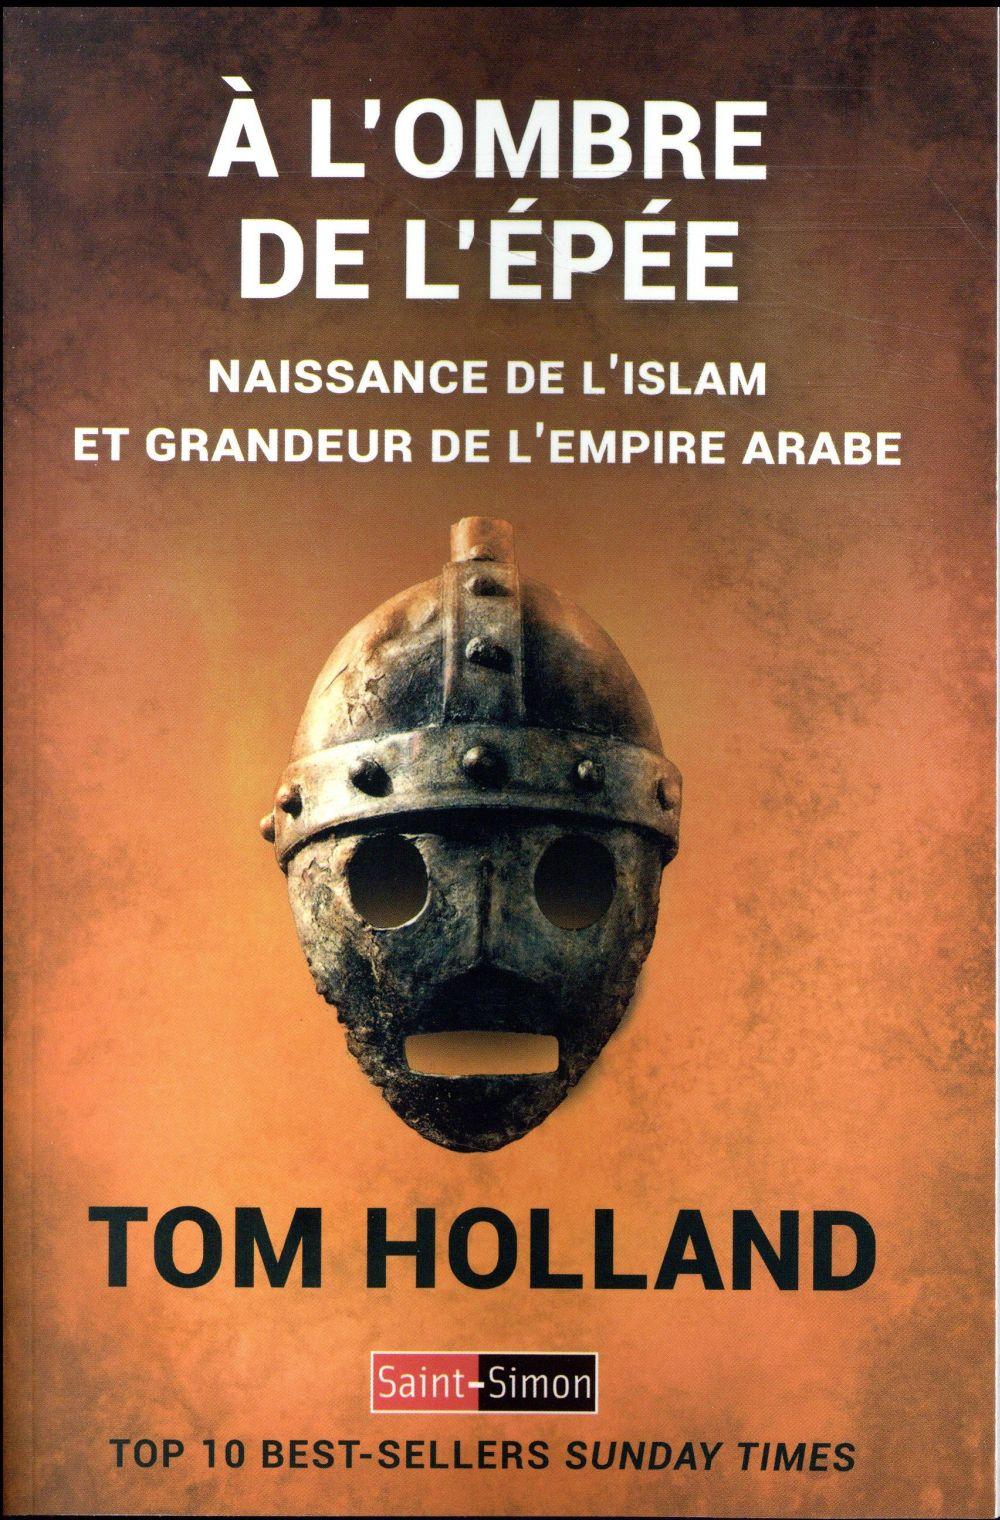 A L'OMBRE DE L'EPEE - NAISSANCE DE L'ISLAM ET GRANDEUR DE L'EMPIRE ARABE